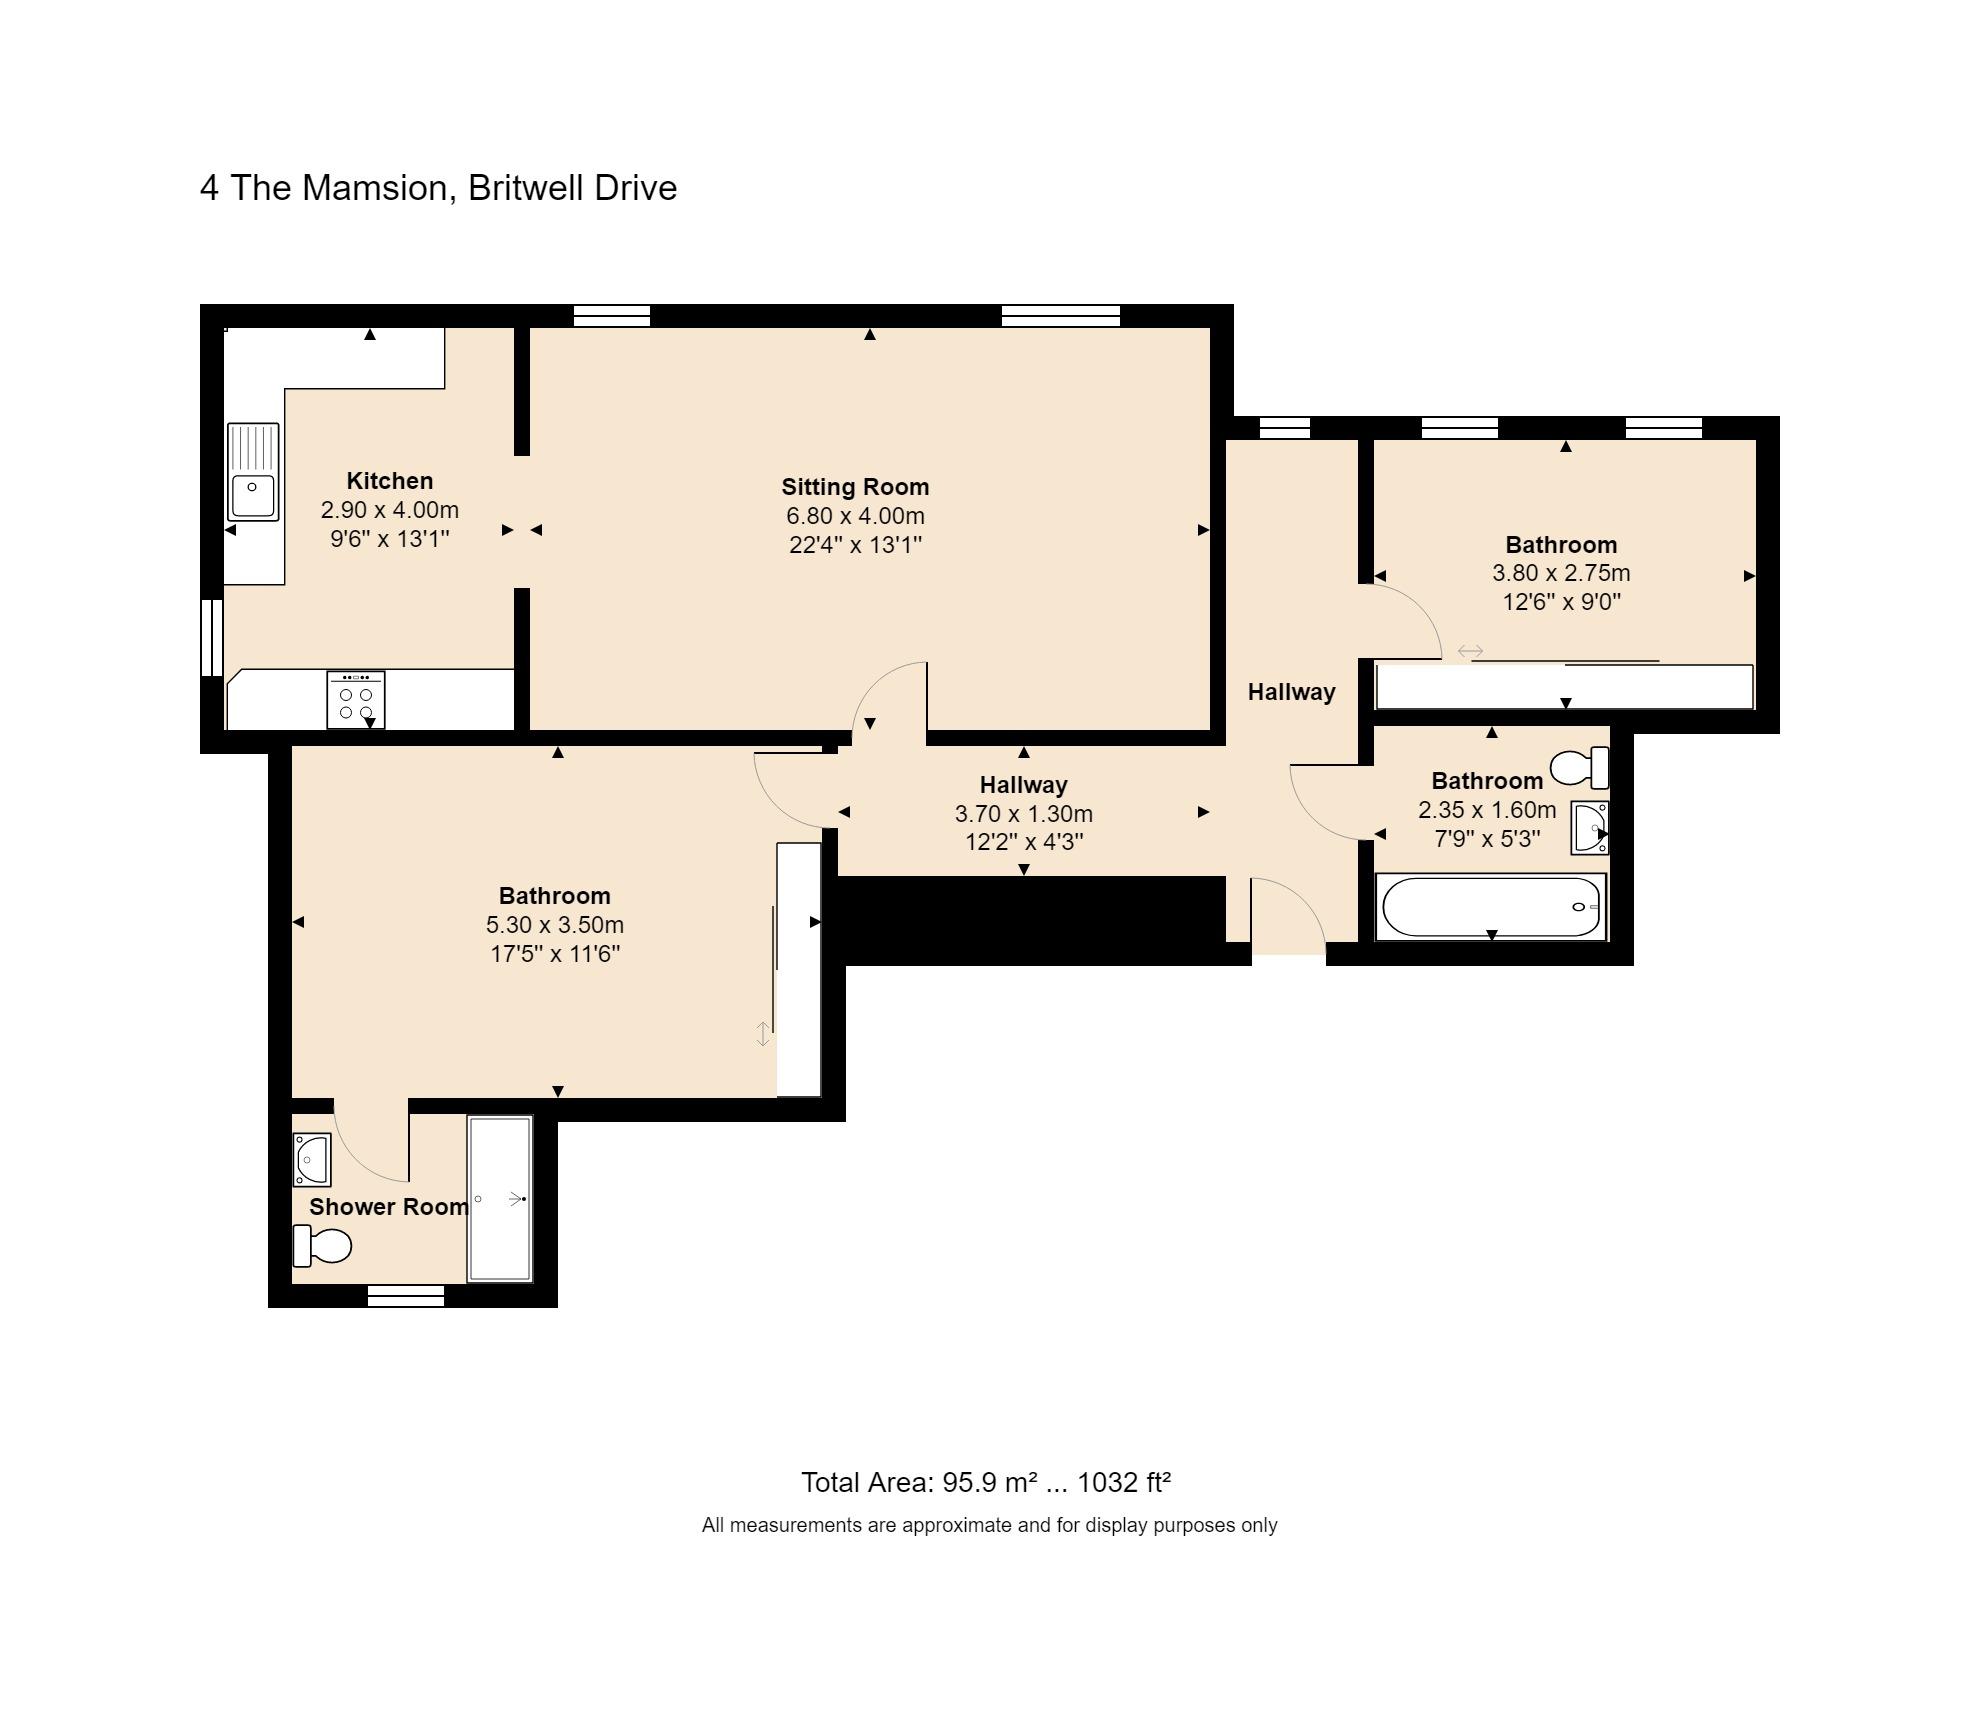 4 The Mansion Floorplan